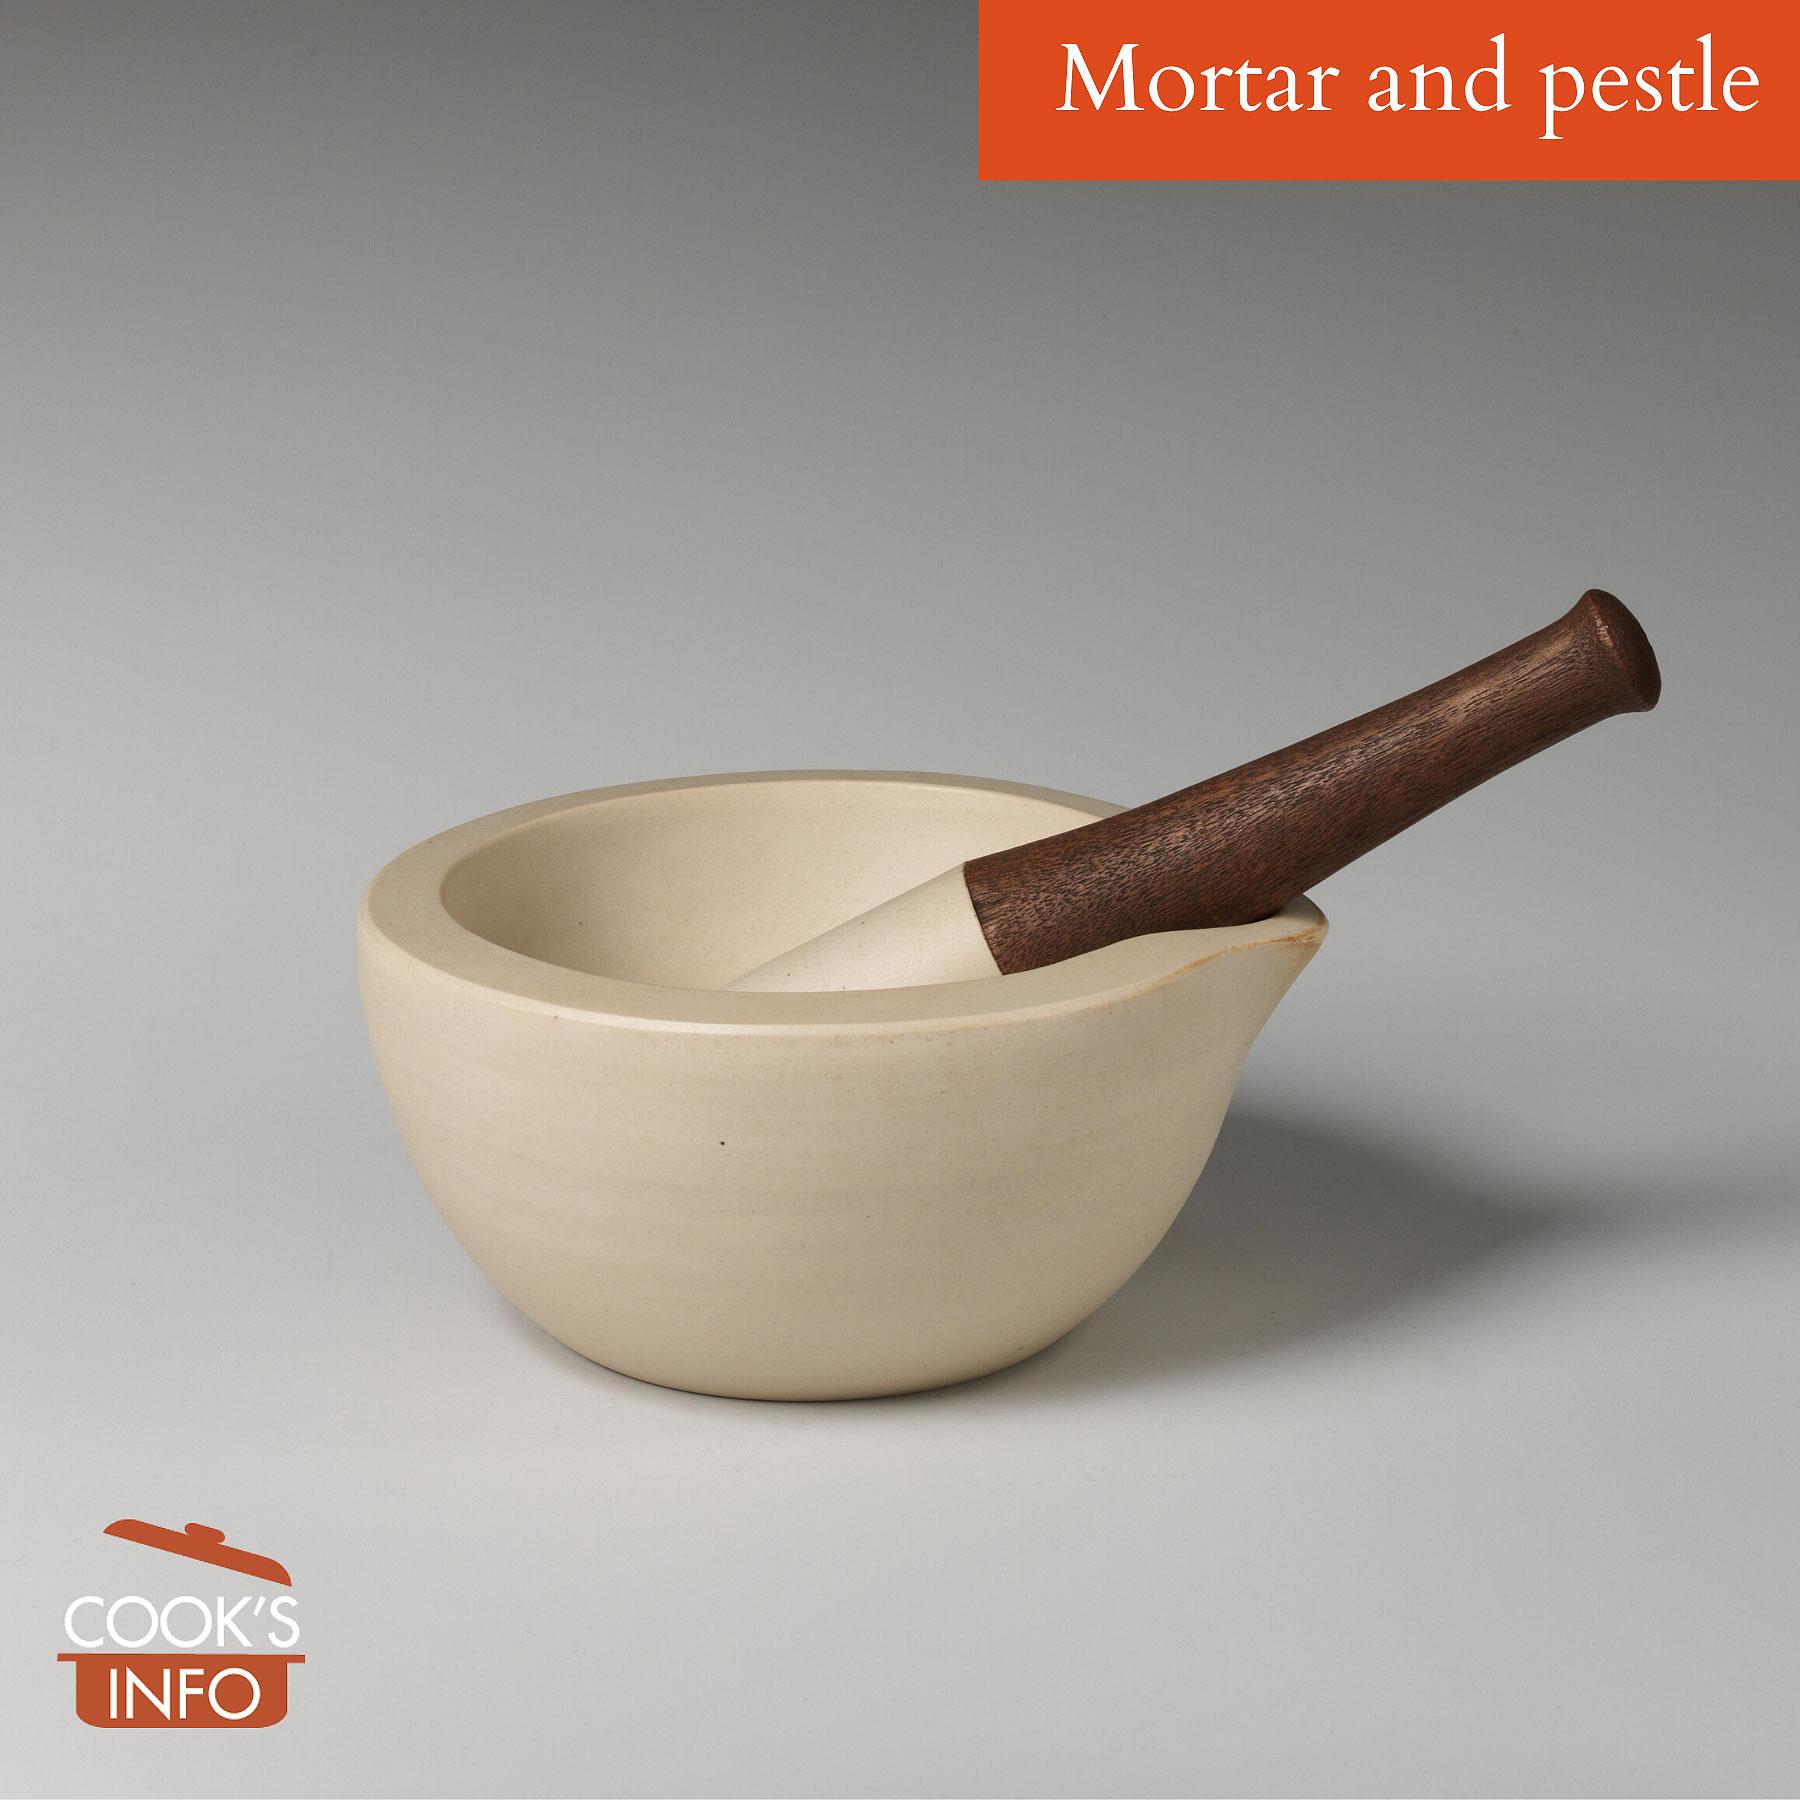 Mortar and pestle of unglazed fine stoneware, wood